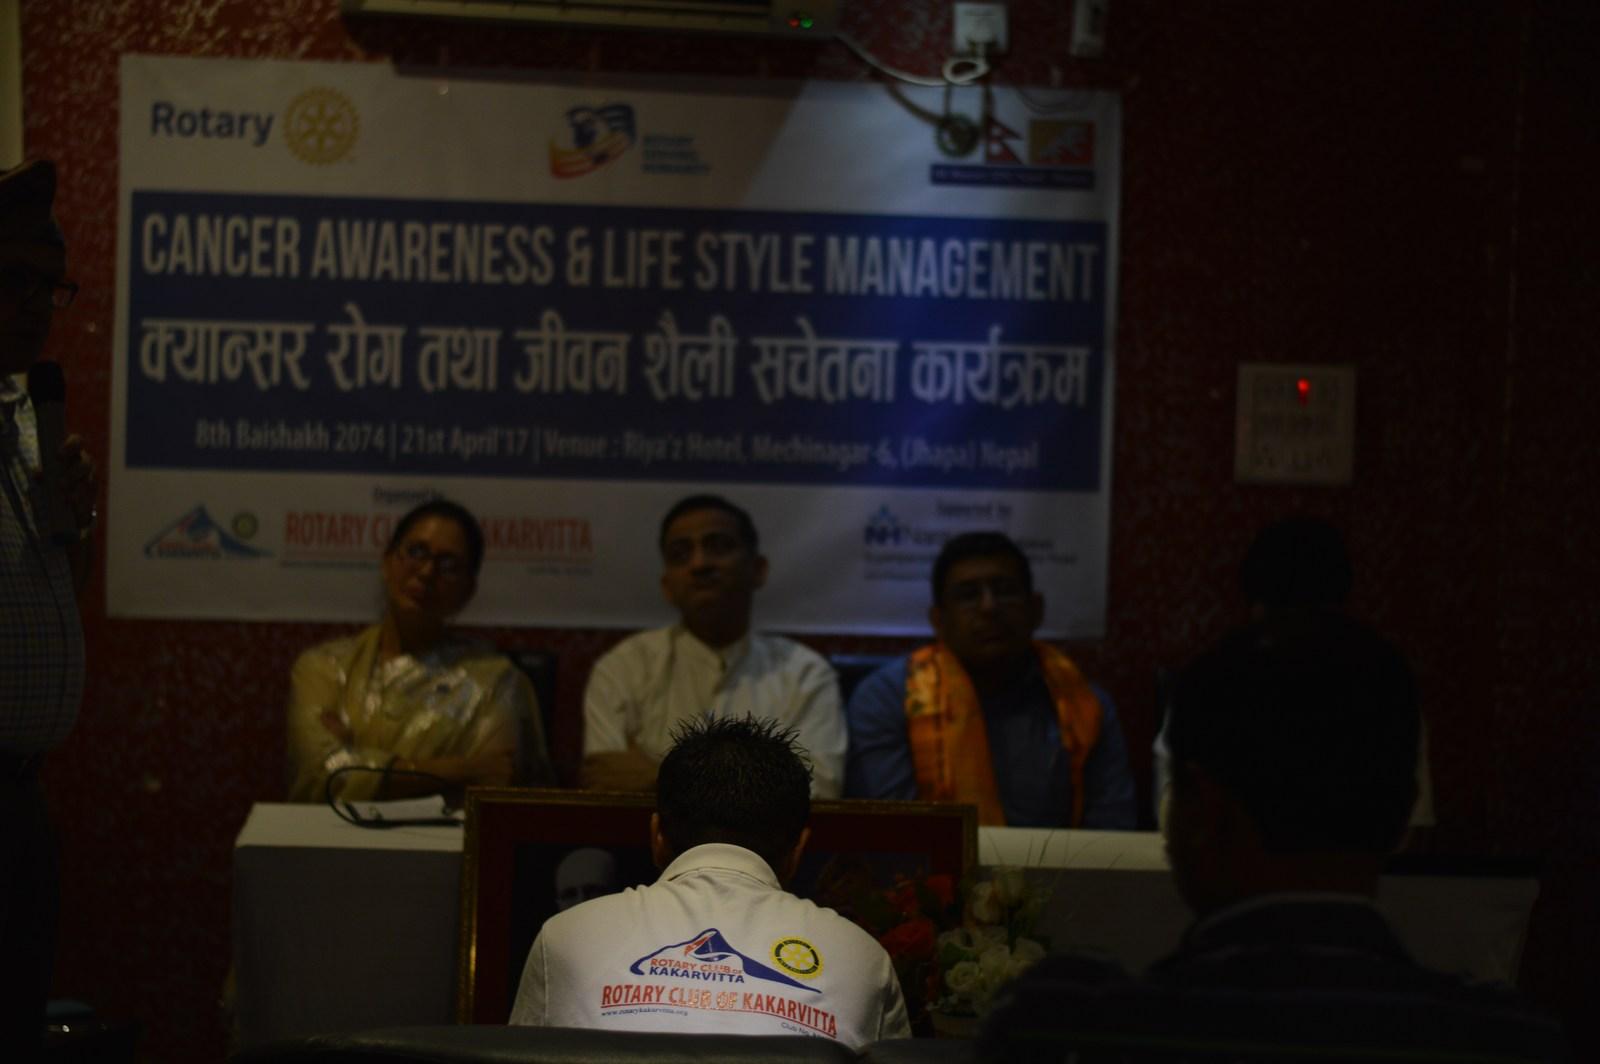 Cancer-Awareness-Life-Style-Management-Interaction-Program-2016-17-Rotary-Club-of-Kakarvitta-97